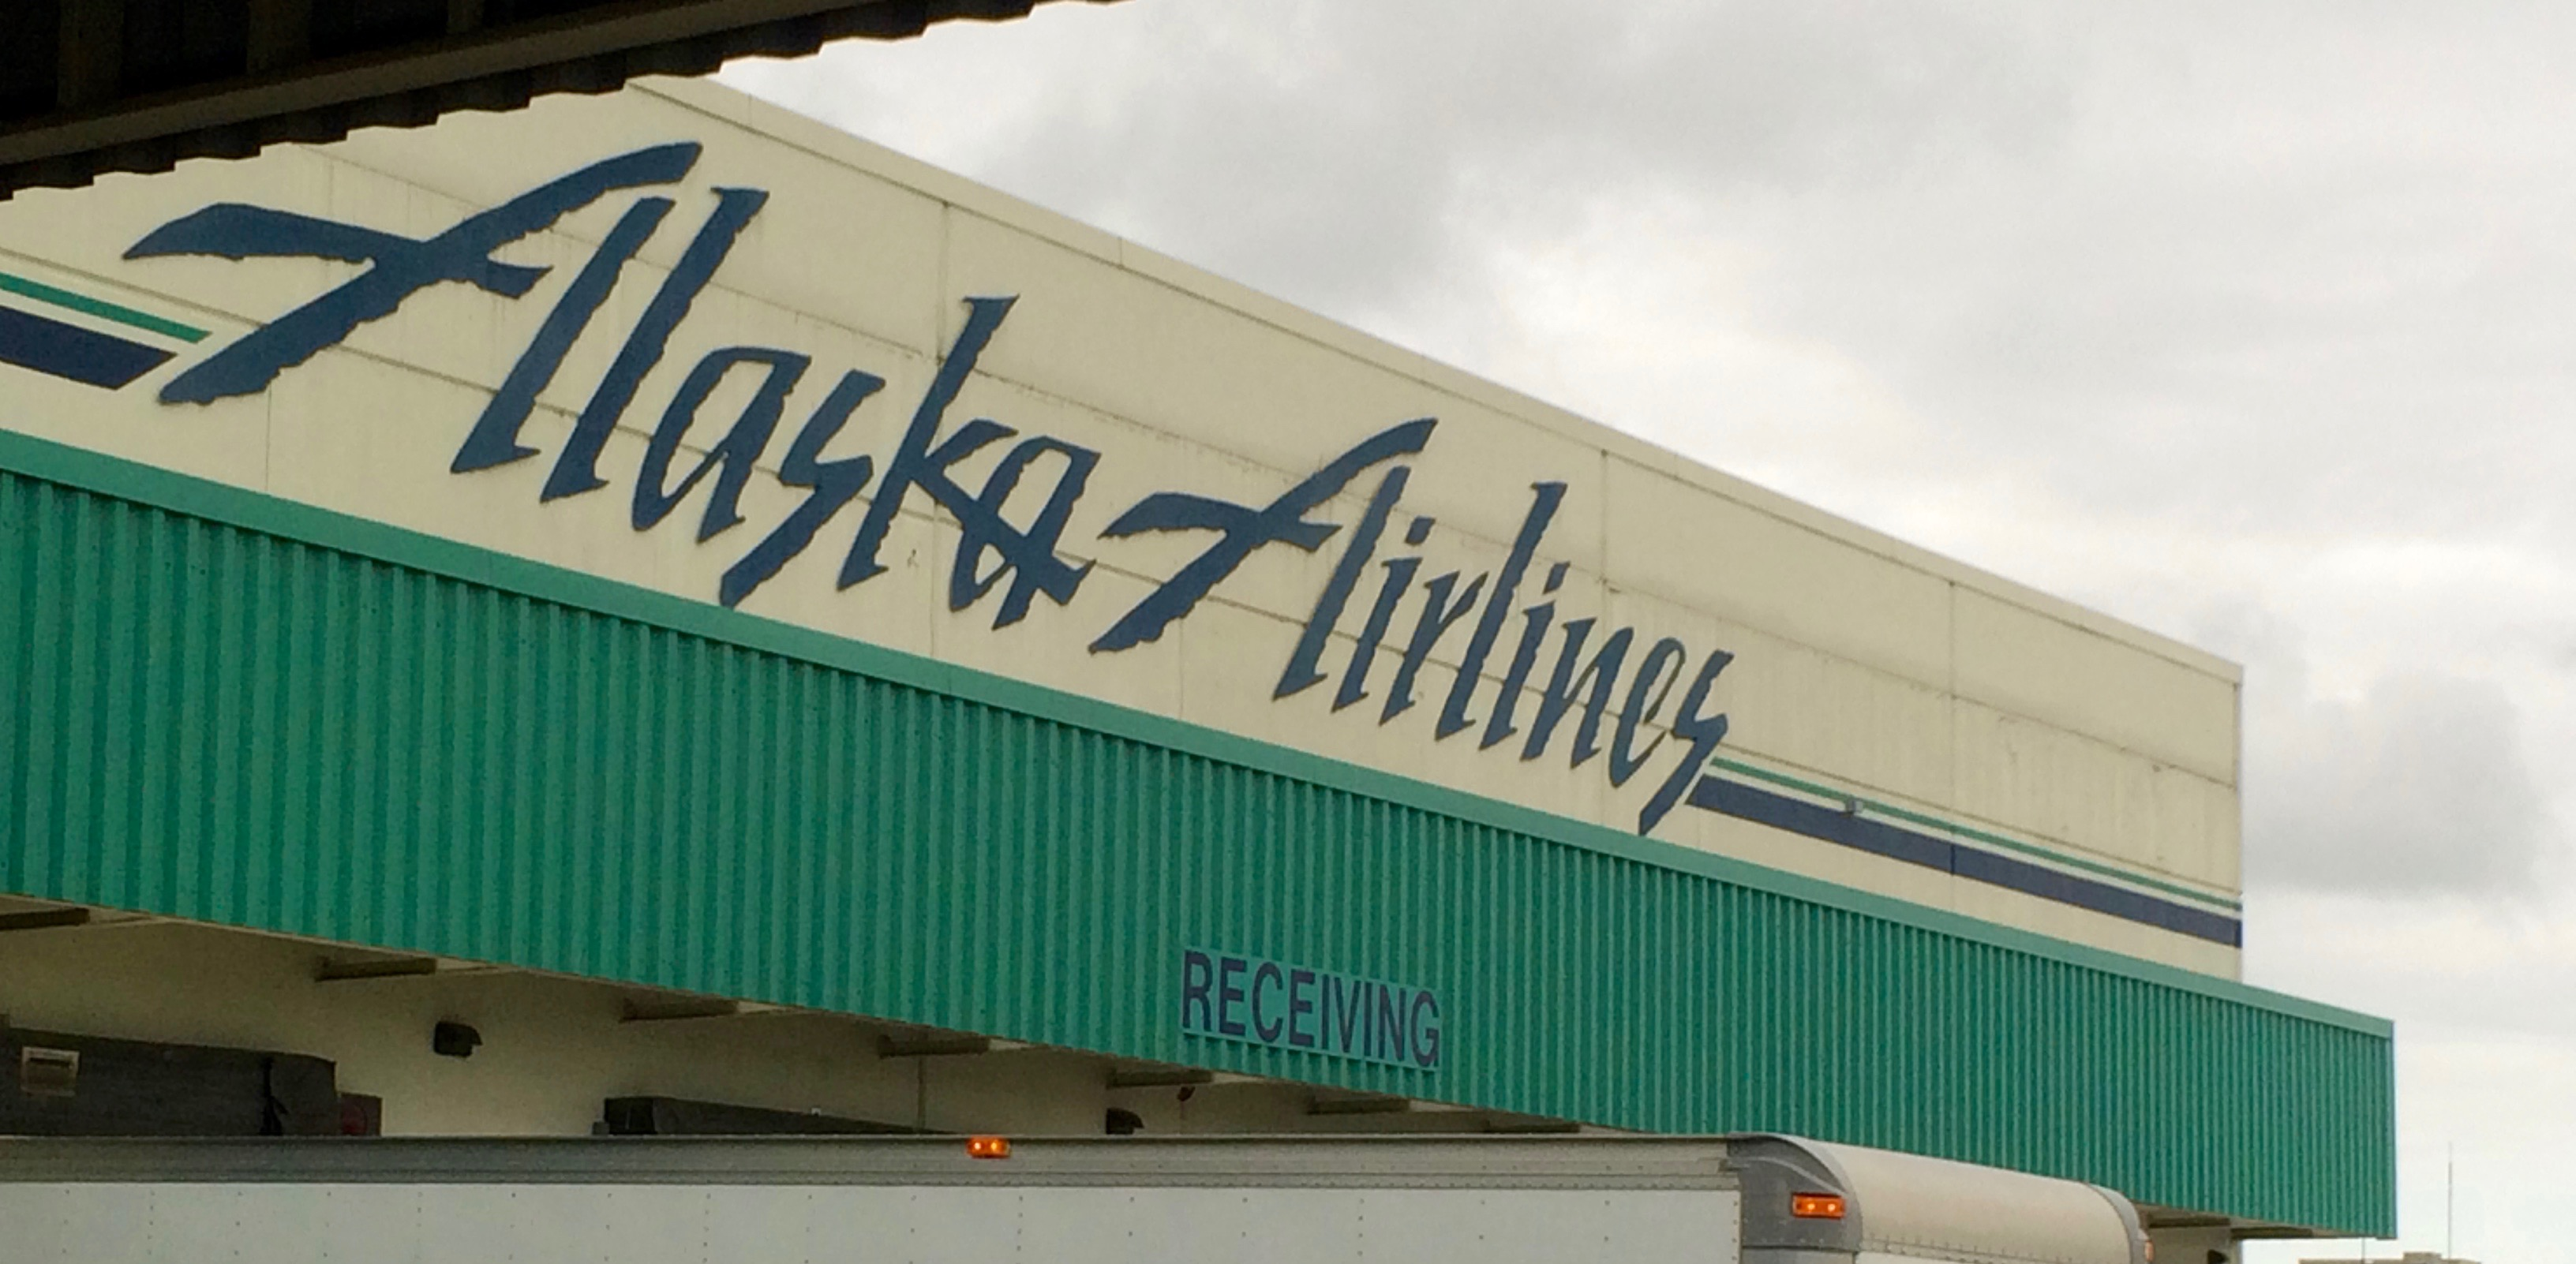 Alaska Air Cargo dock